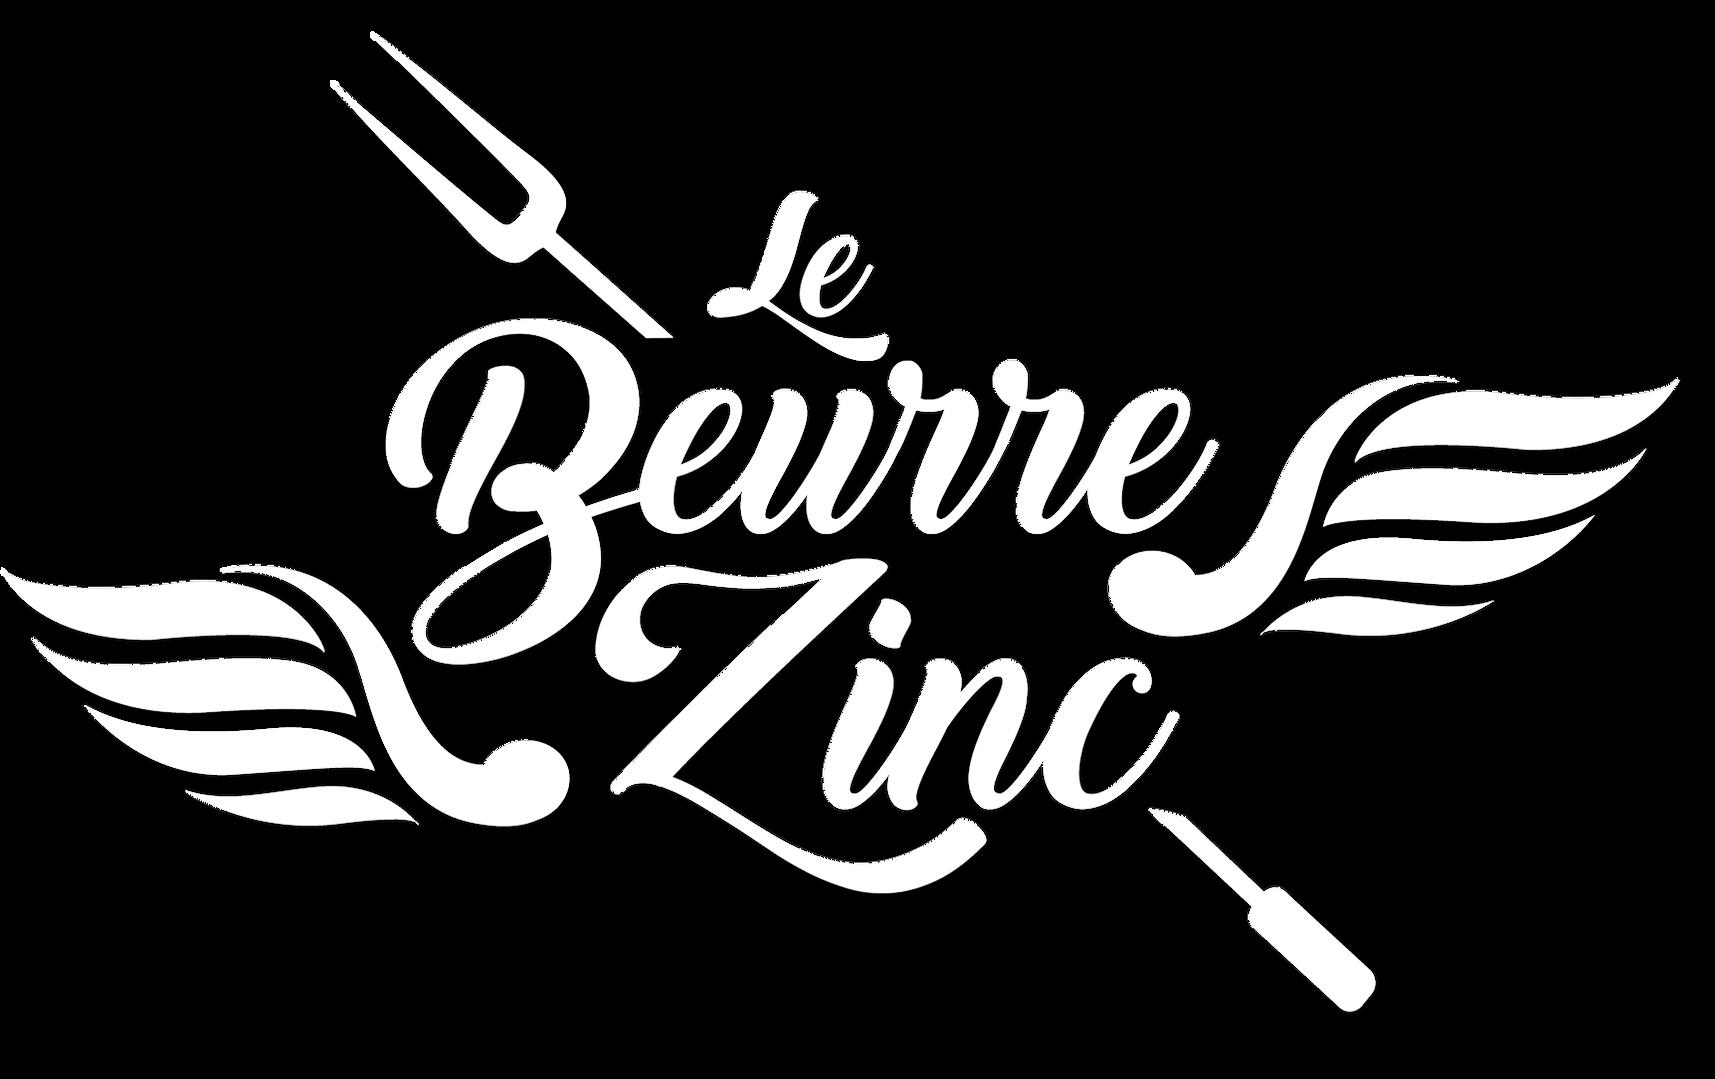 SA3-Beurre-ZInc-base-graphic-f2-10.png